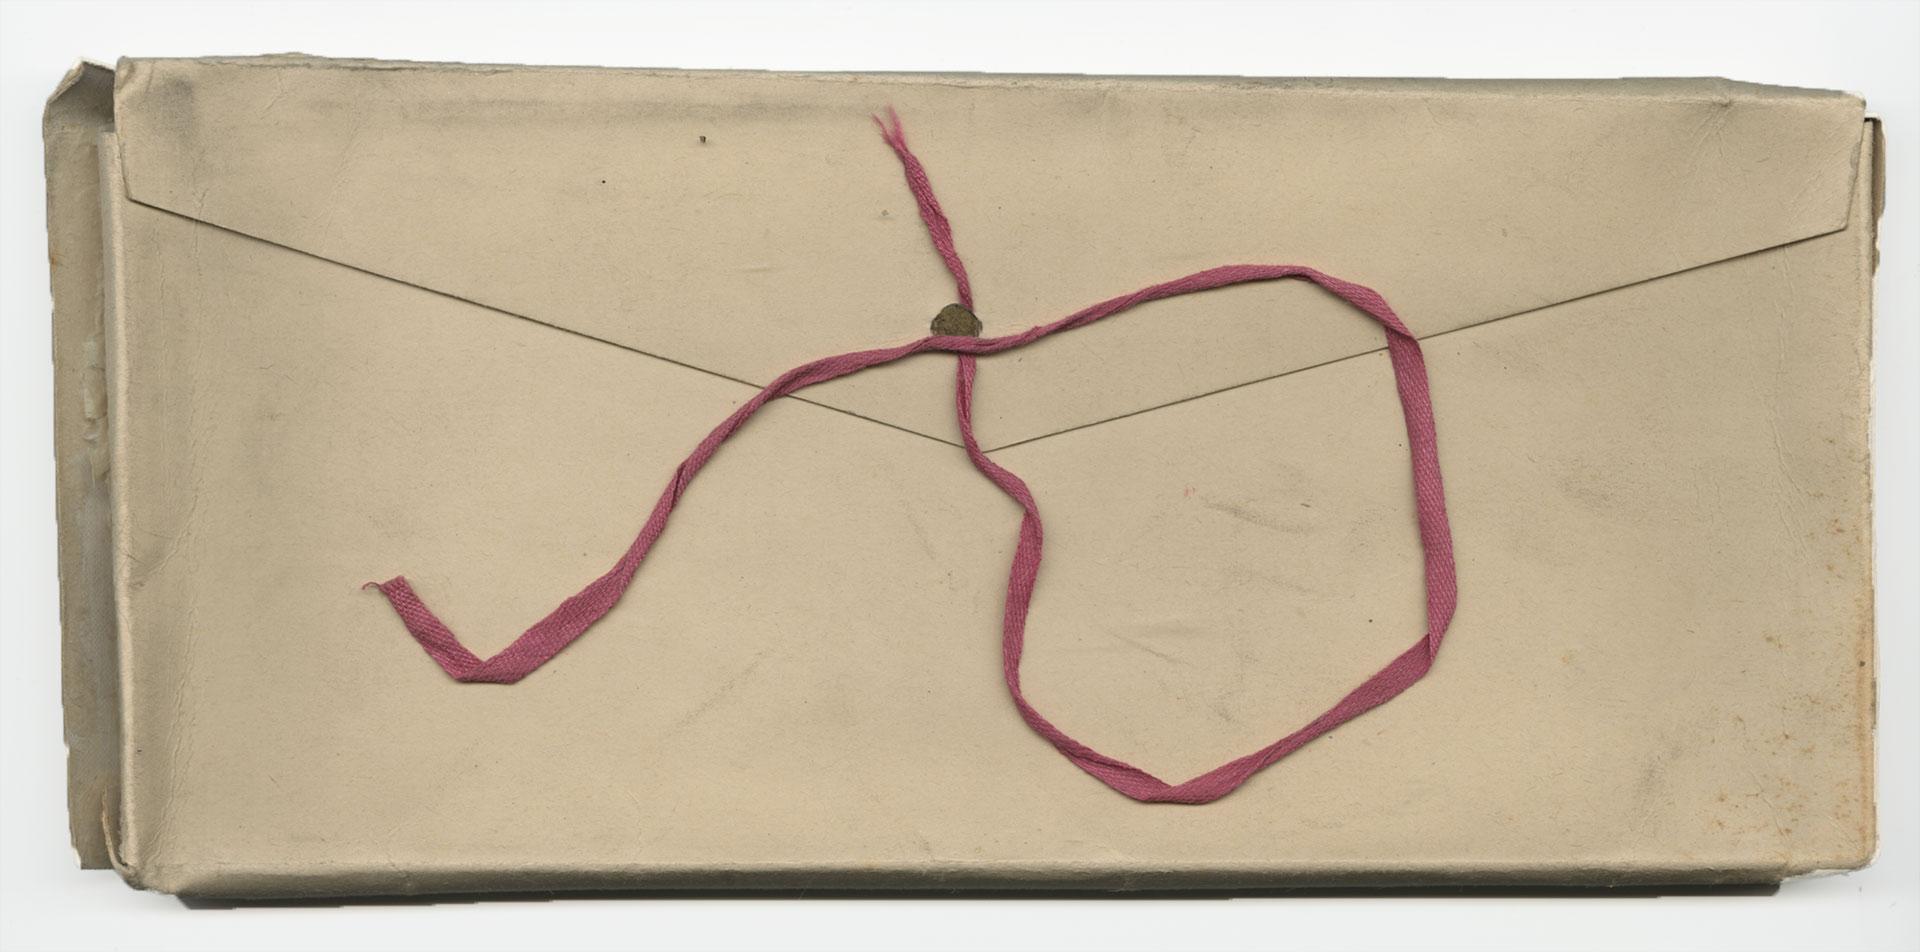 Maud Veach case file, Prison Public Memory Project